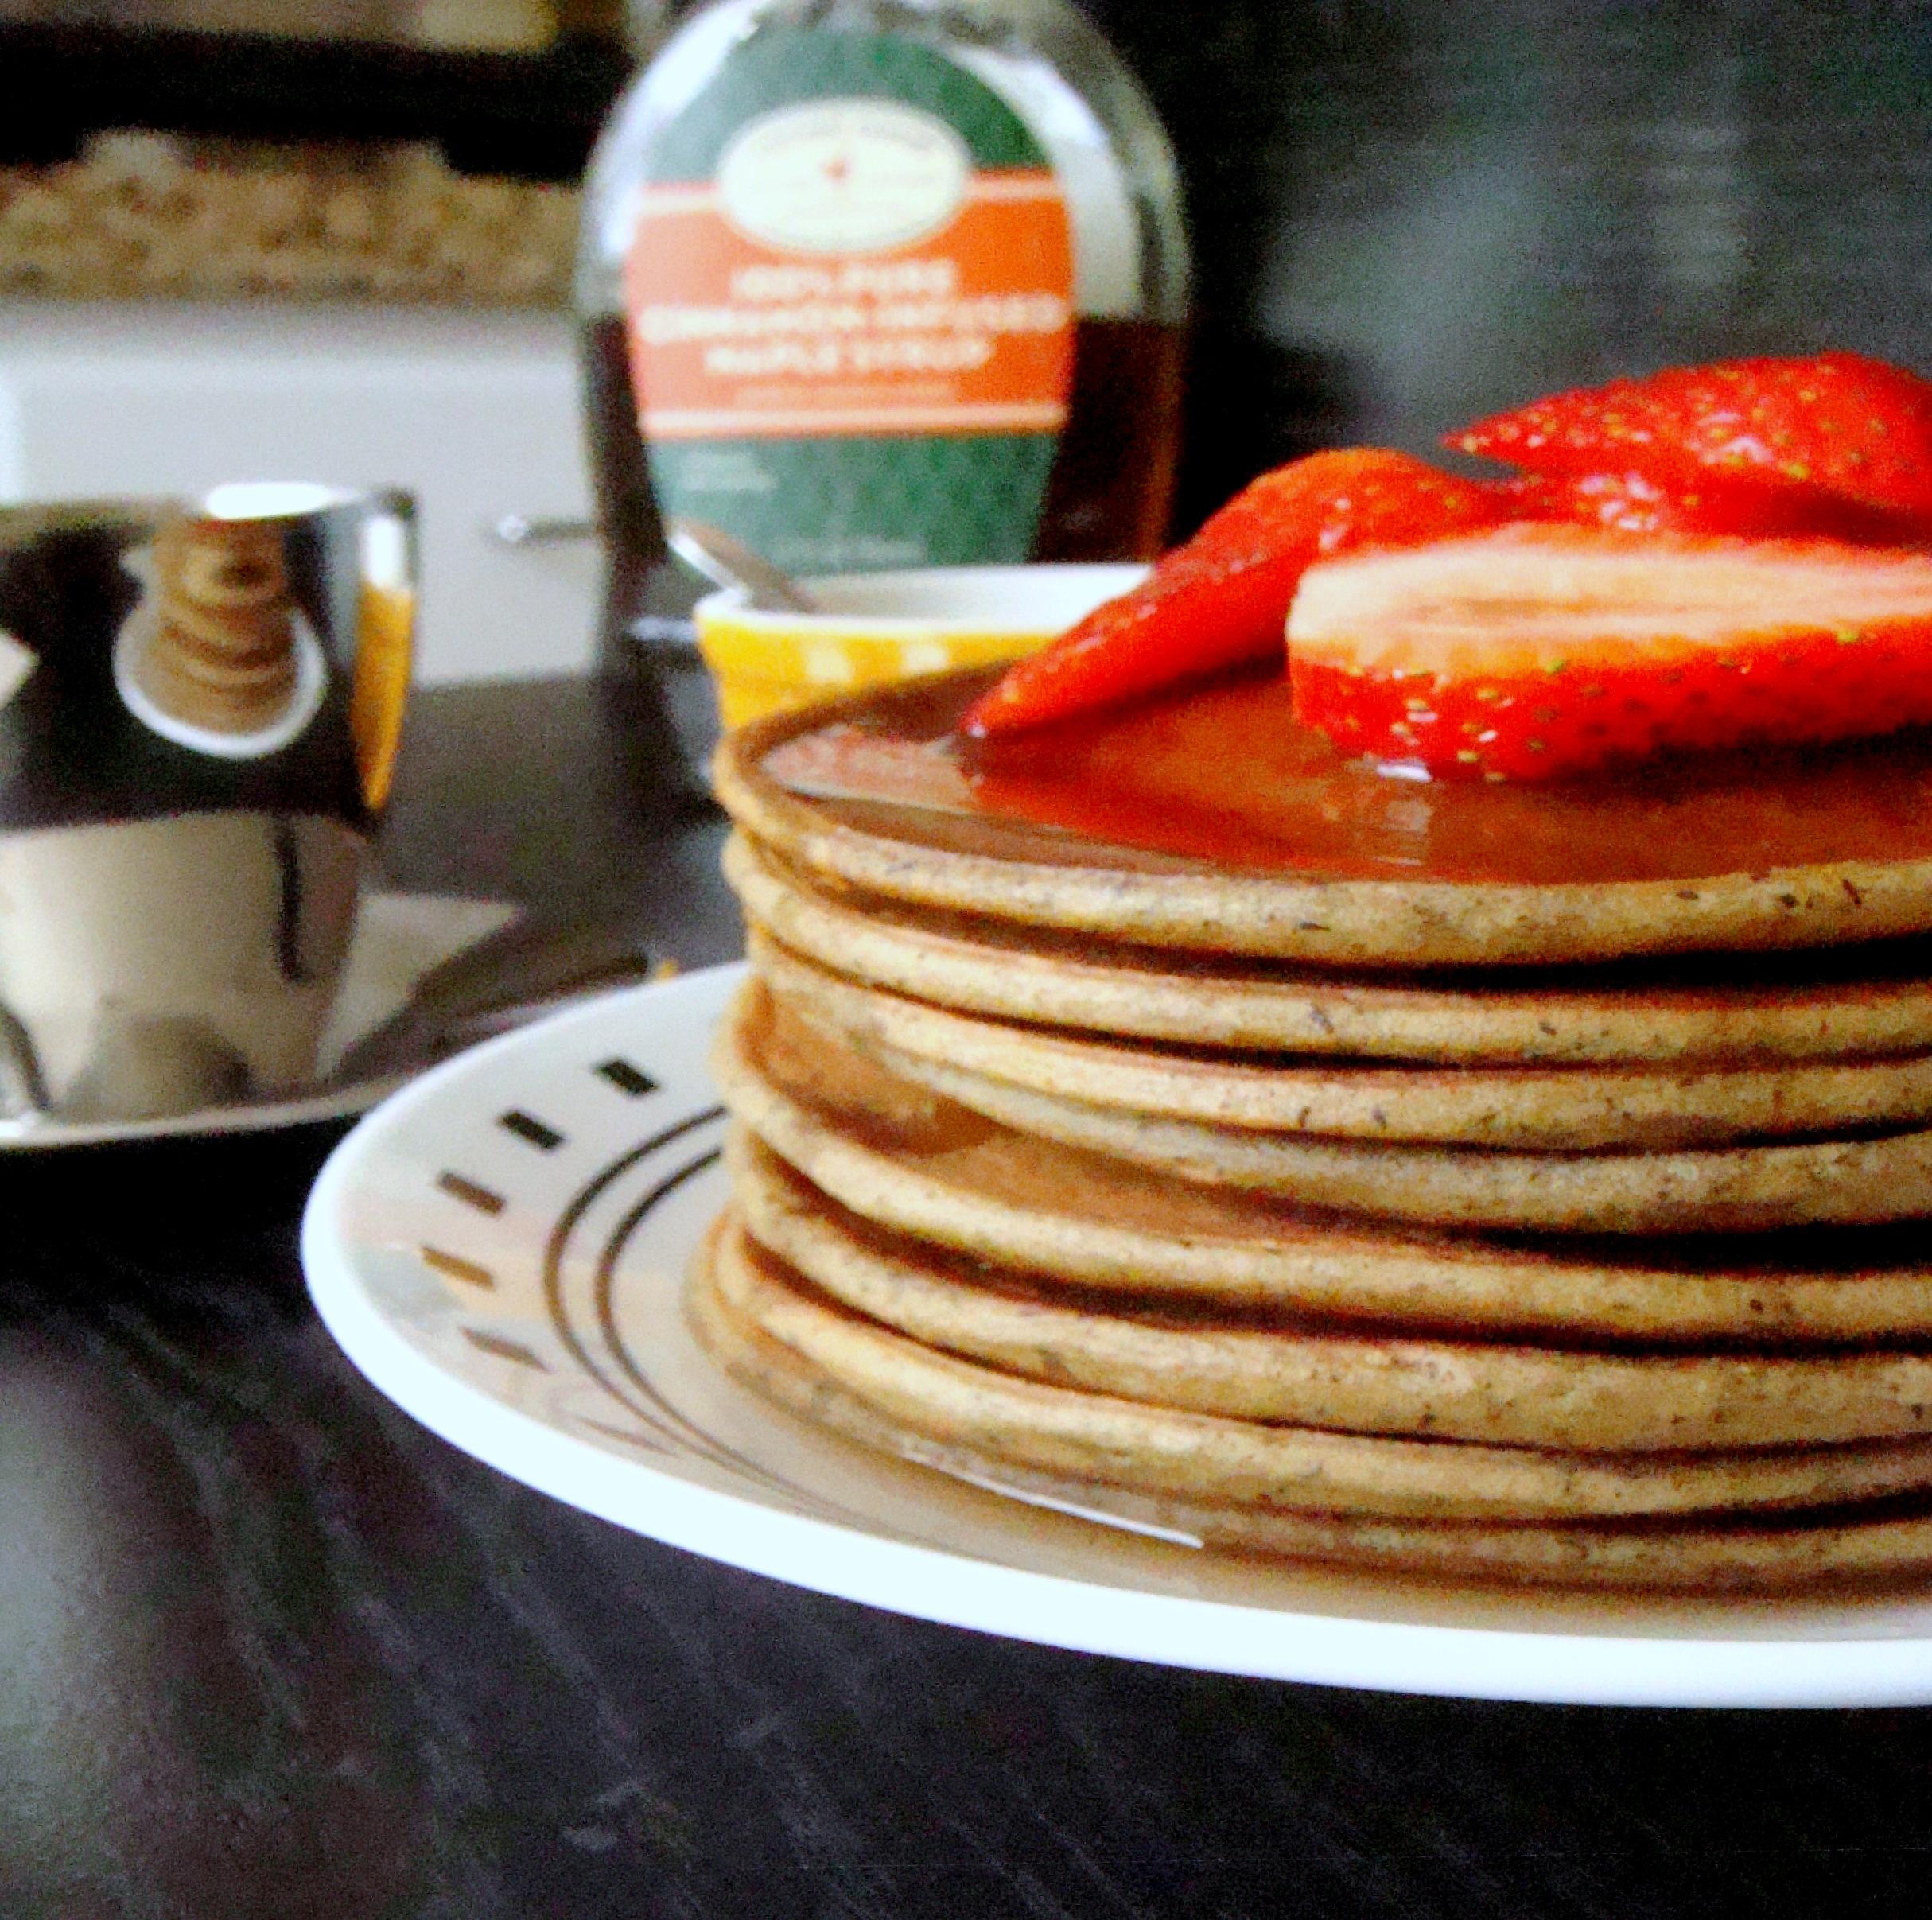 Smitten Kitchen Pancakes: Avocado Buckwheat Pancake